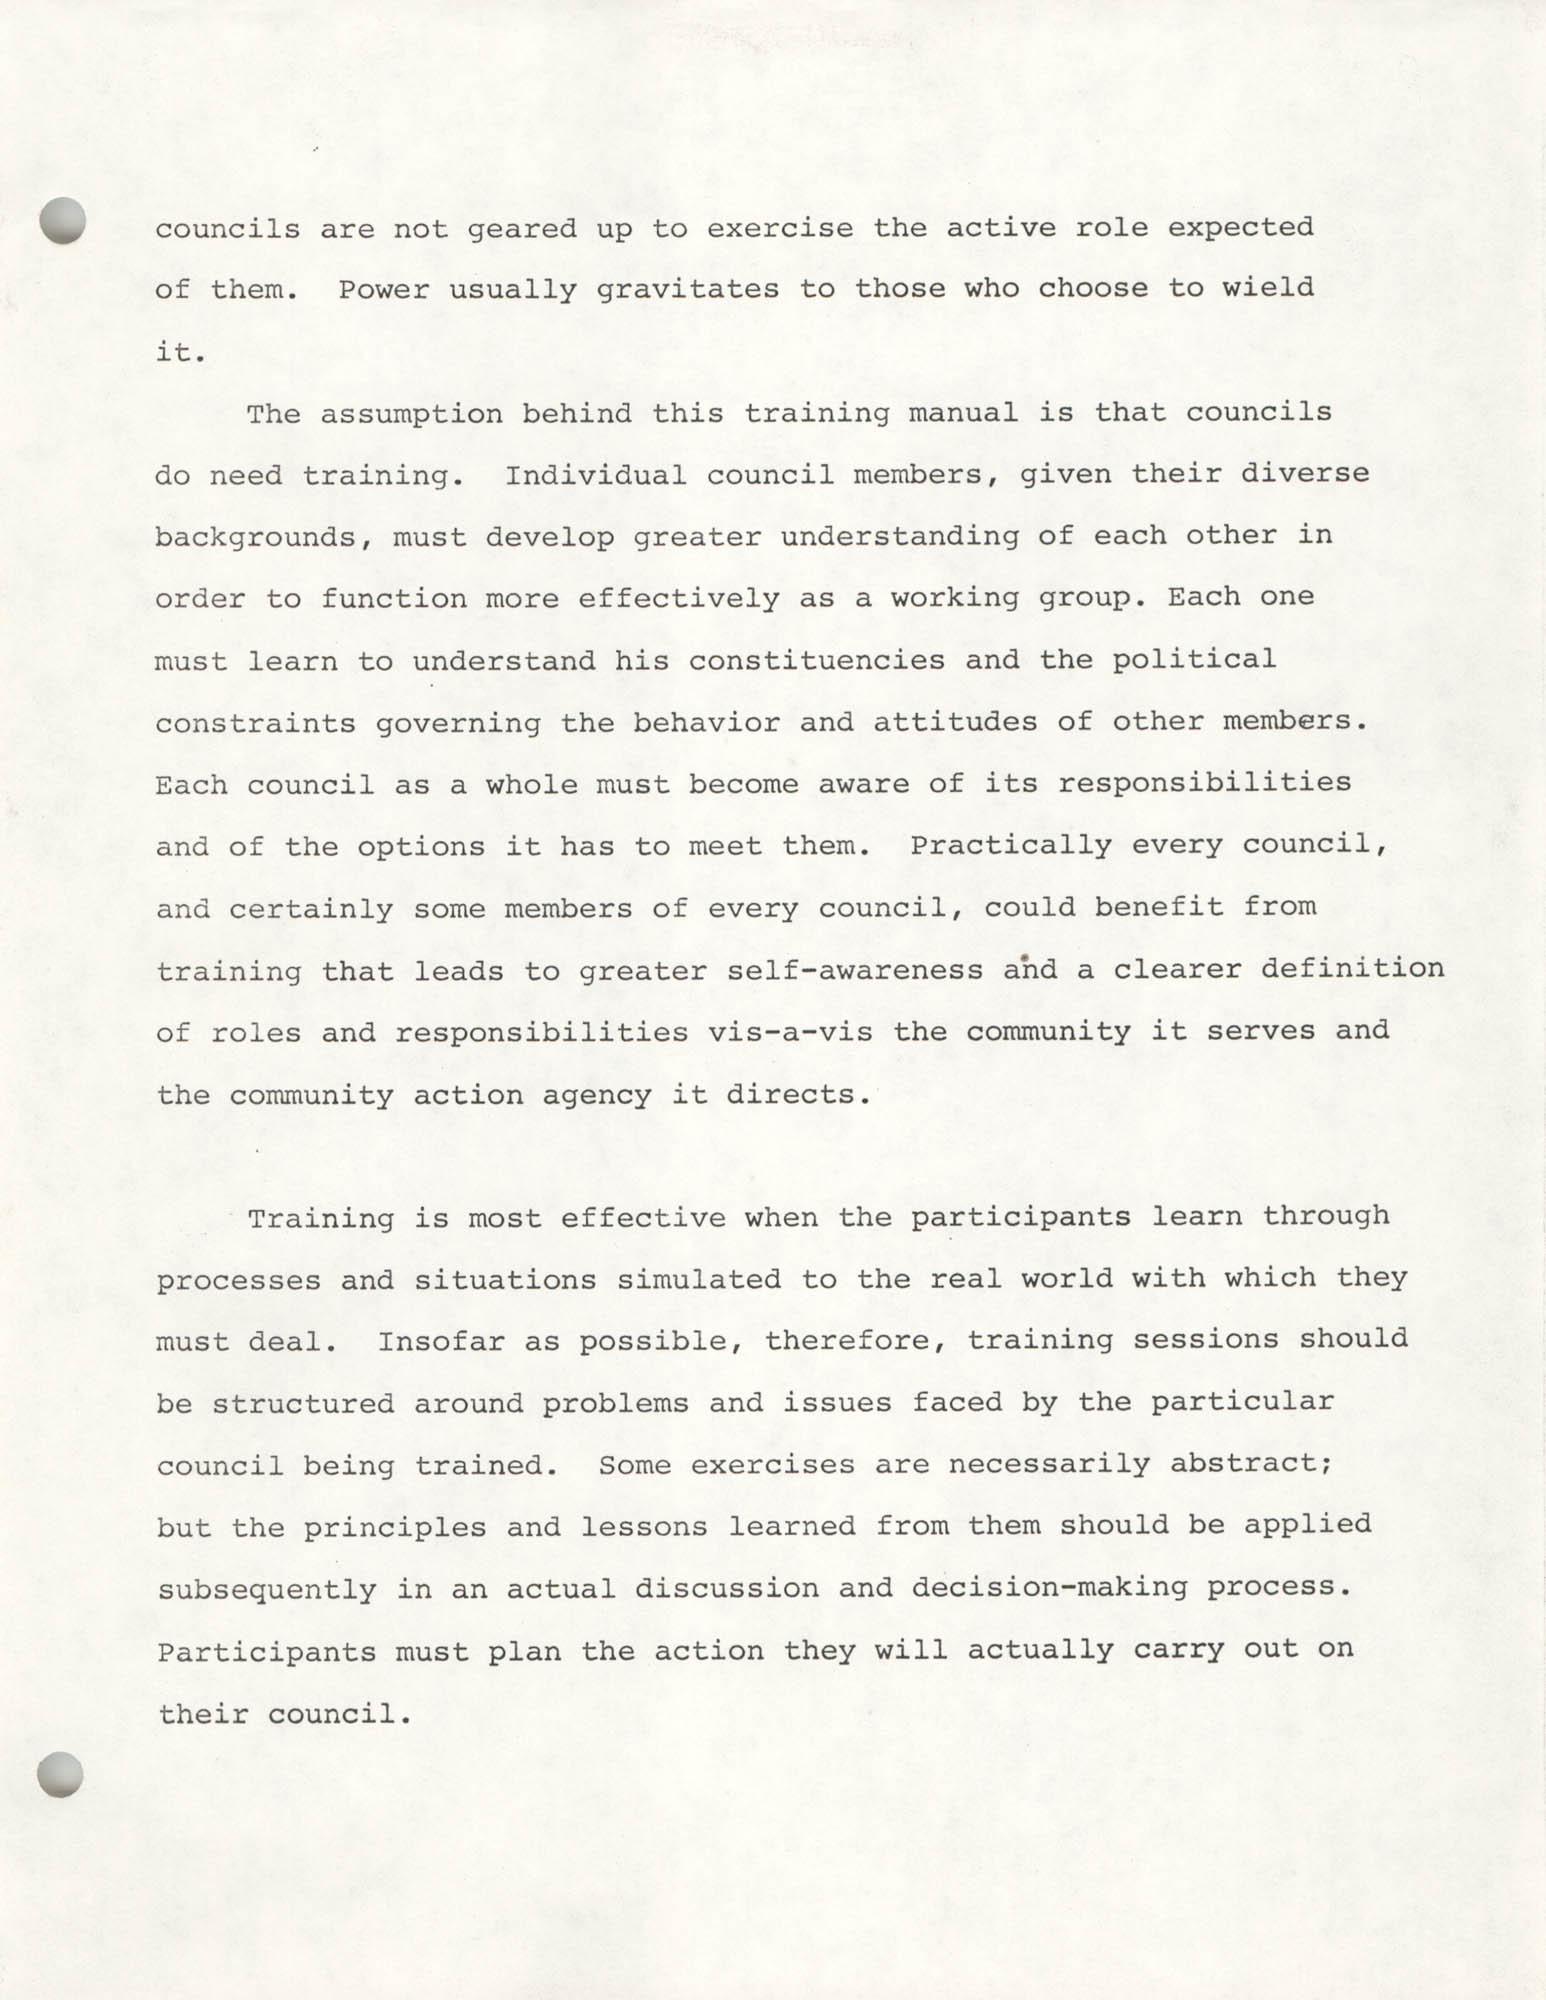 COBRA Rudimentary Training Manual, Page 2